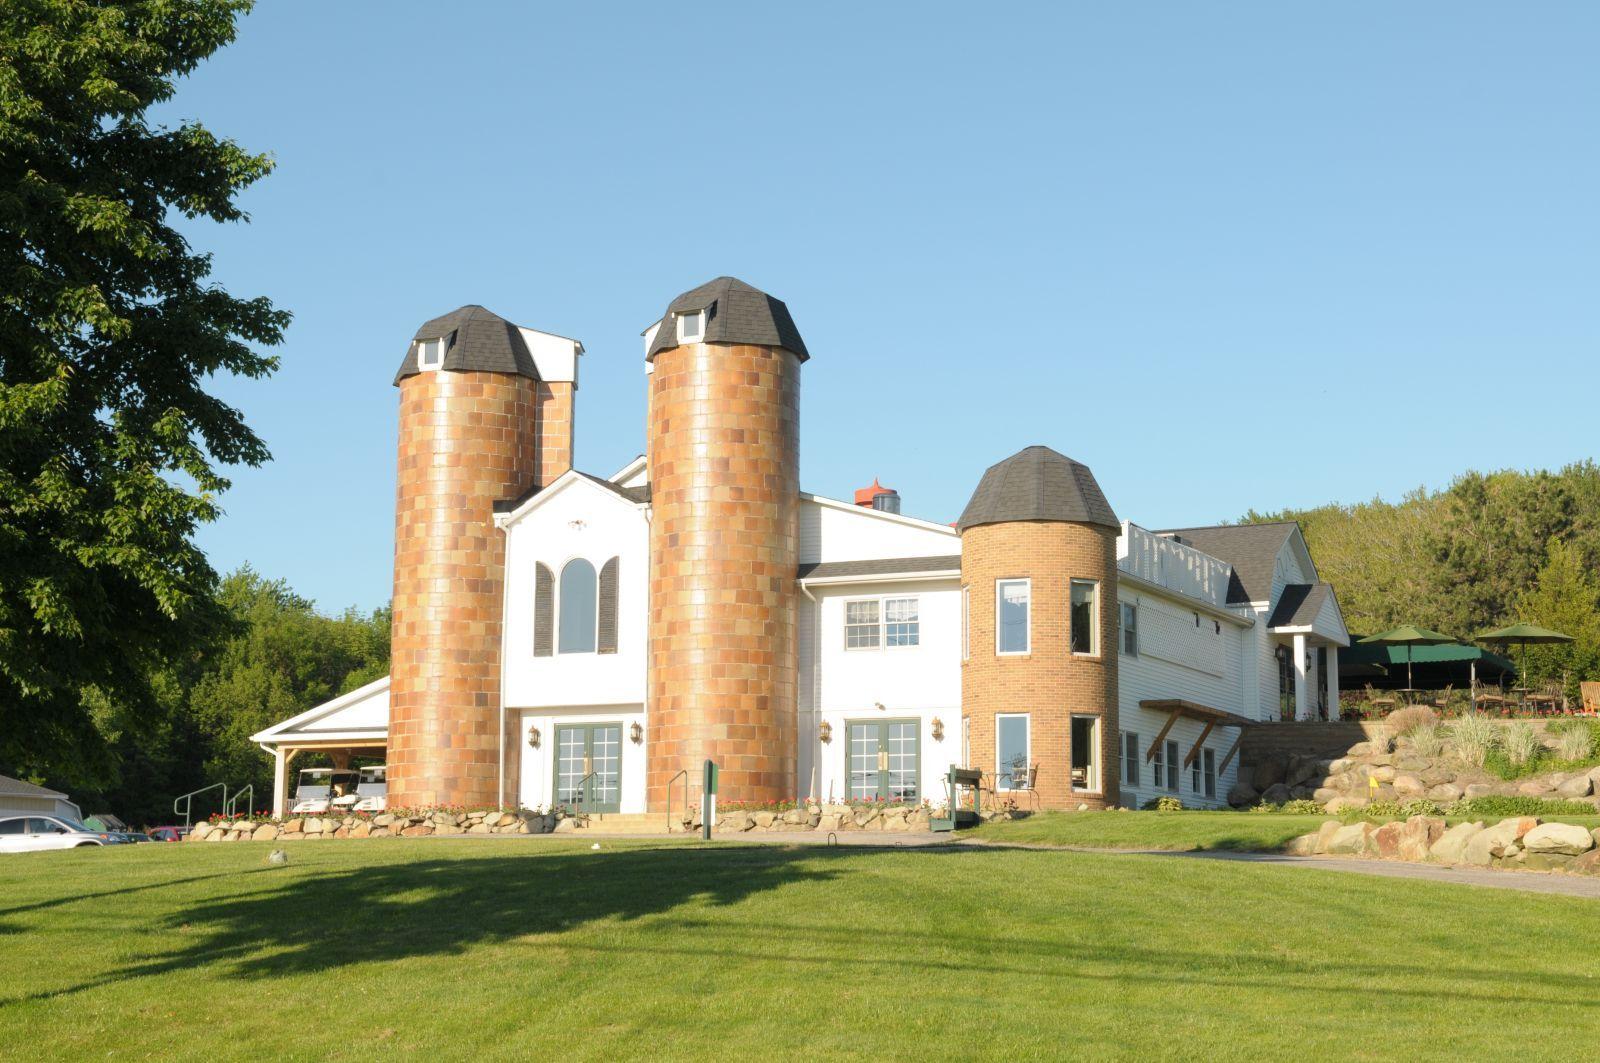 Legend lake golf course concord ohio hotel wedding